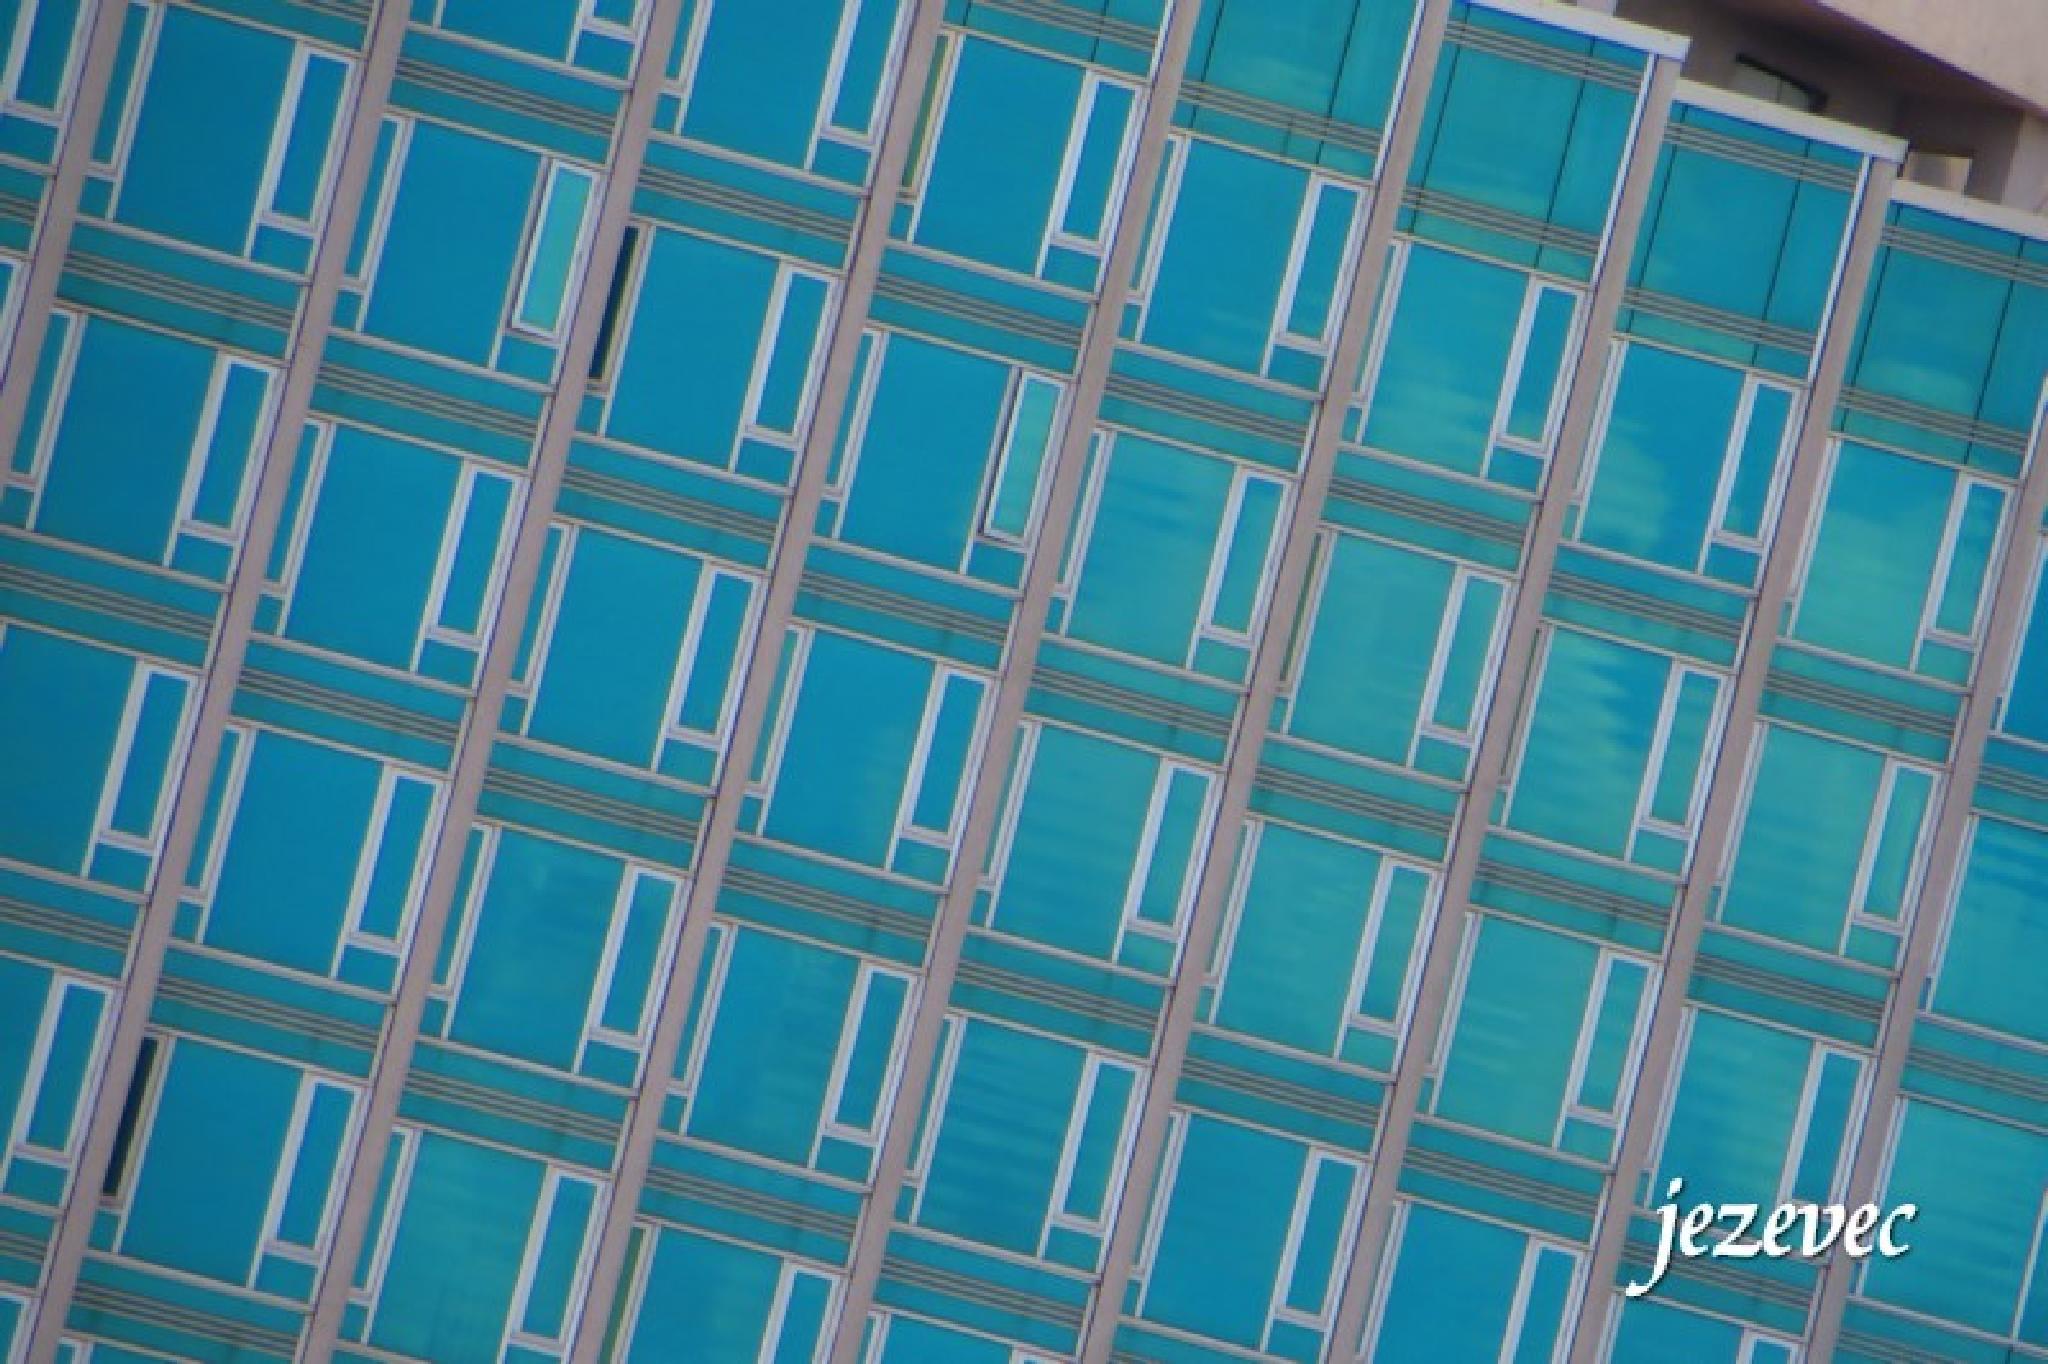 Panels Blue, New York City 2014-07-20 0285 by jezevec40